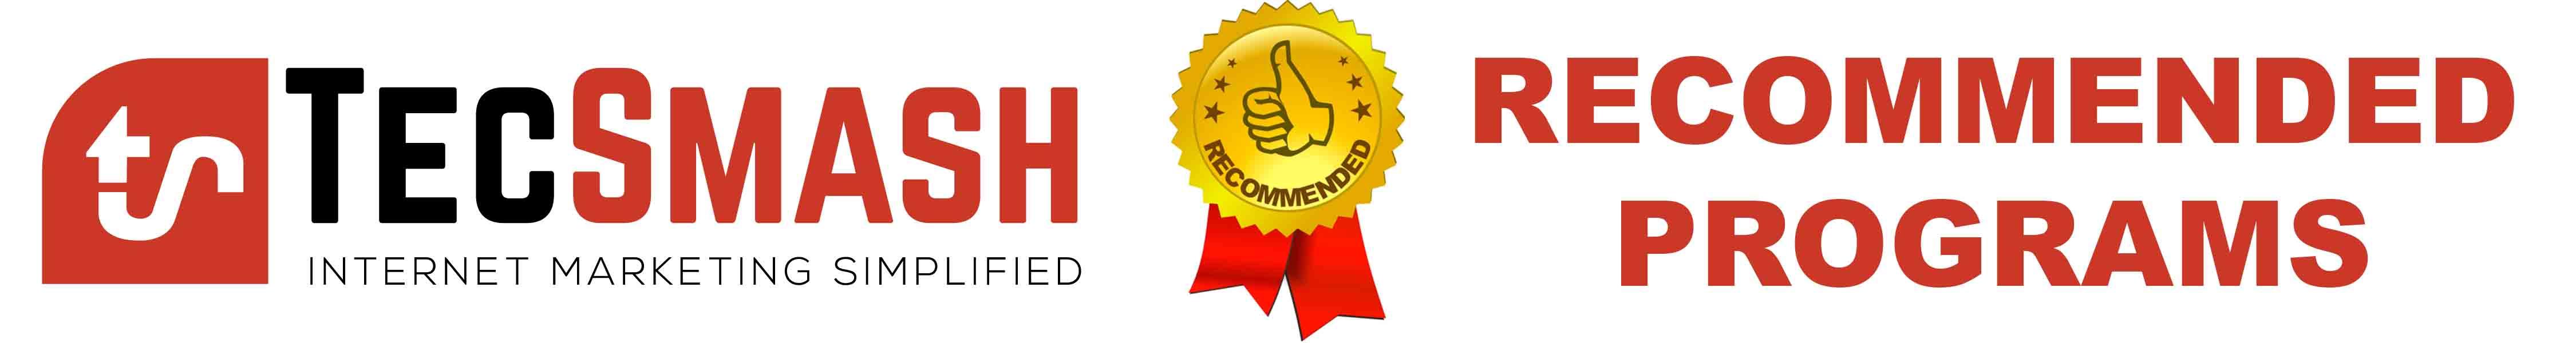 Tecsmash recommended programs